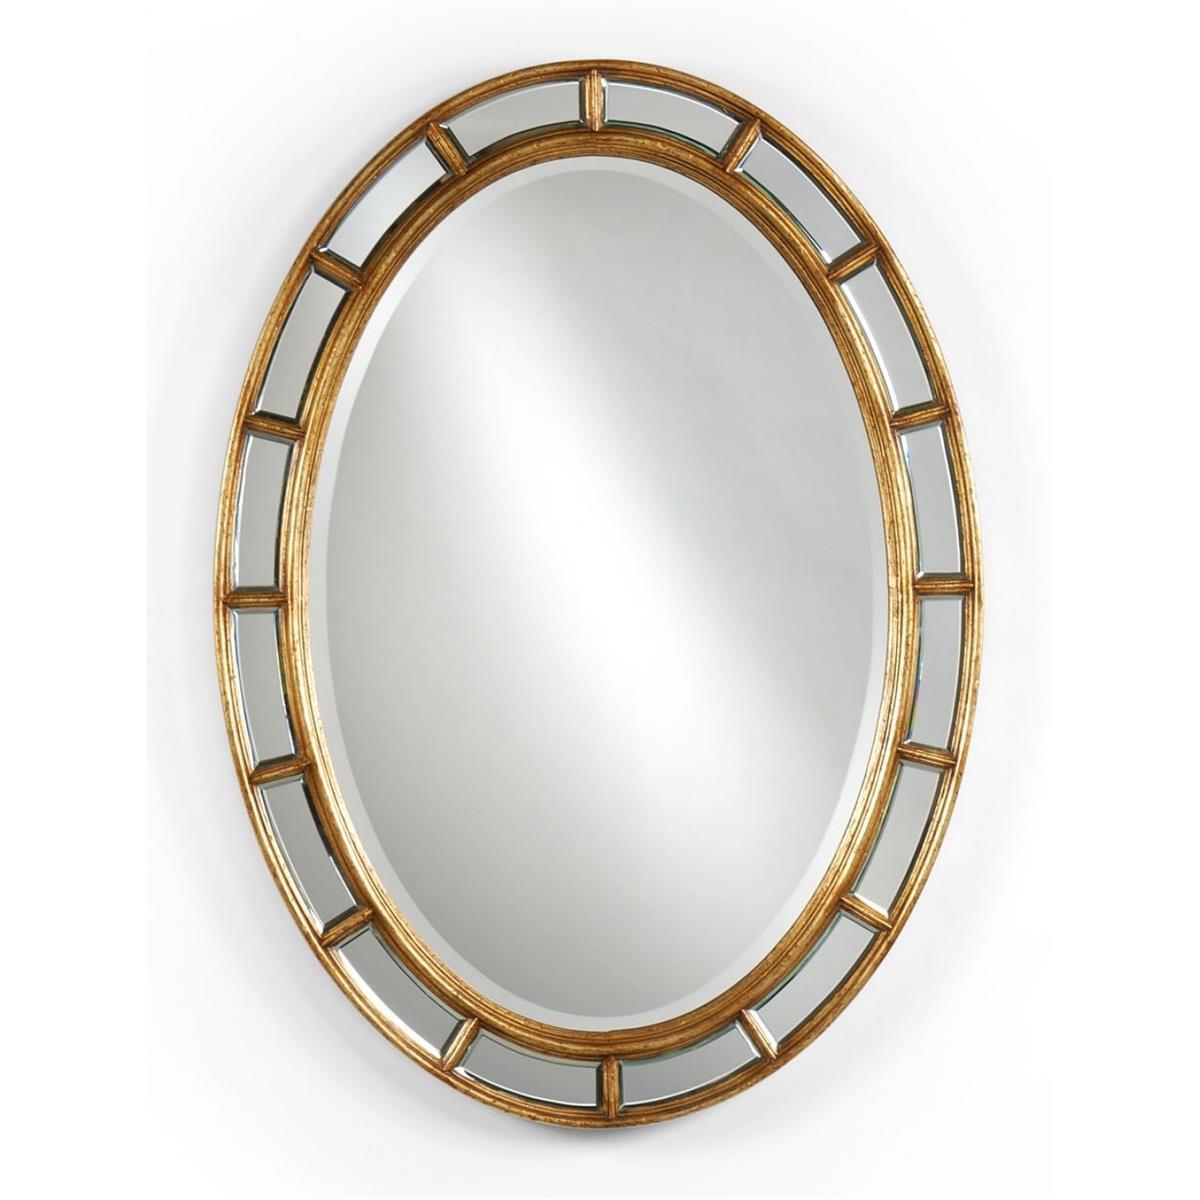 492697 Walnut Framed Oval Panelled Gilded Mirror - на 360.ru: цены, описание, характеристики, где купить в Москве.